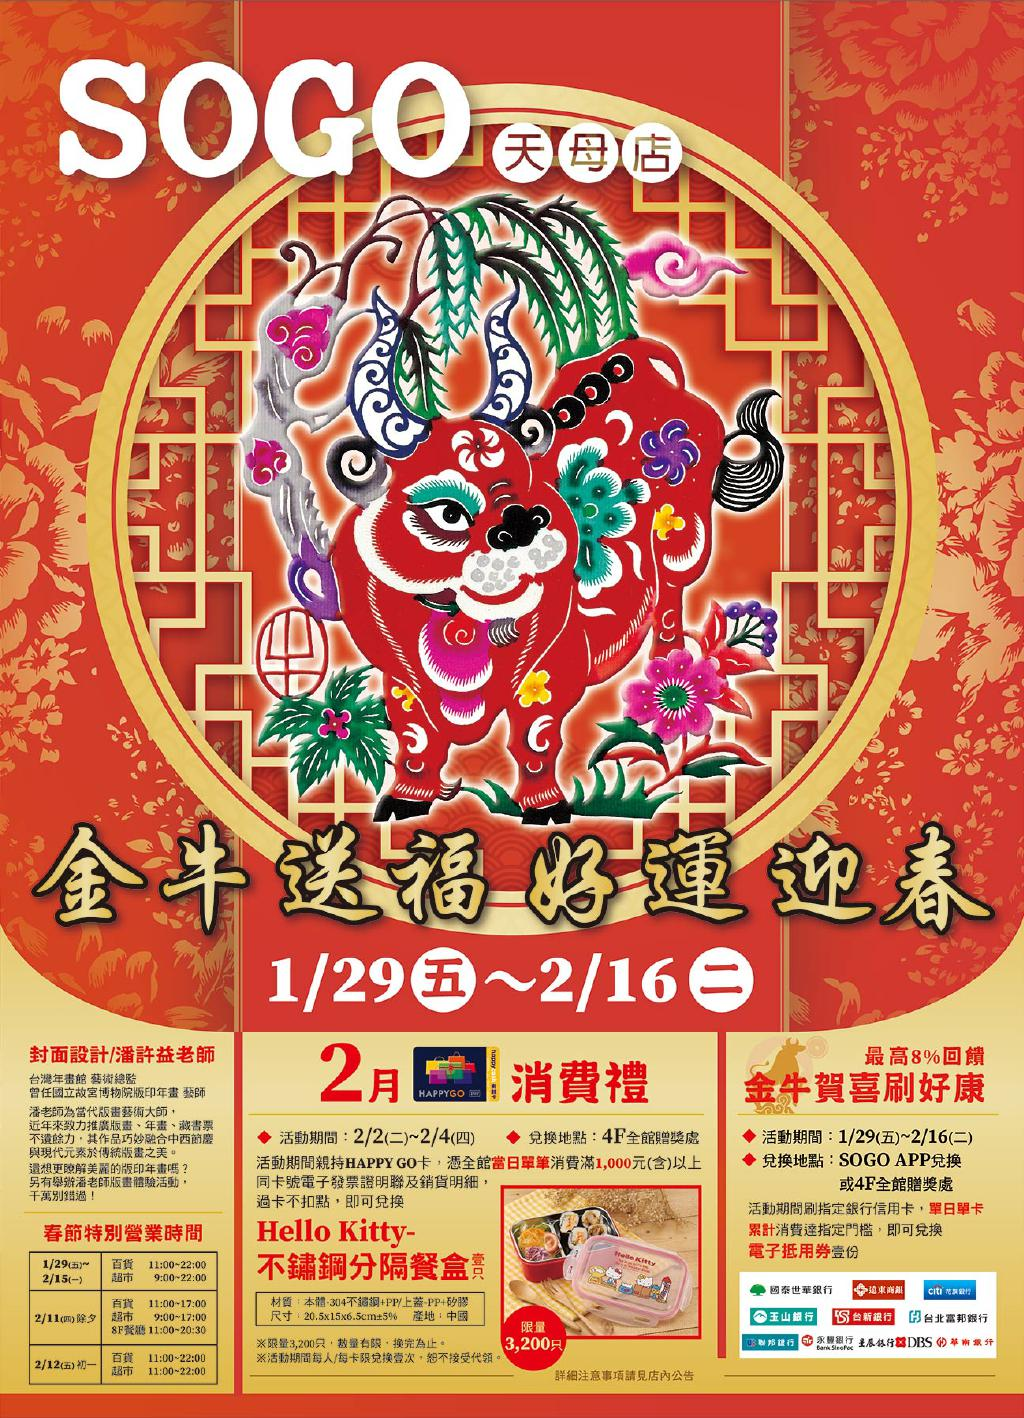 SOGO《天母店》DM「金牛送福 好運迎春」 【2021/2/16 止】